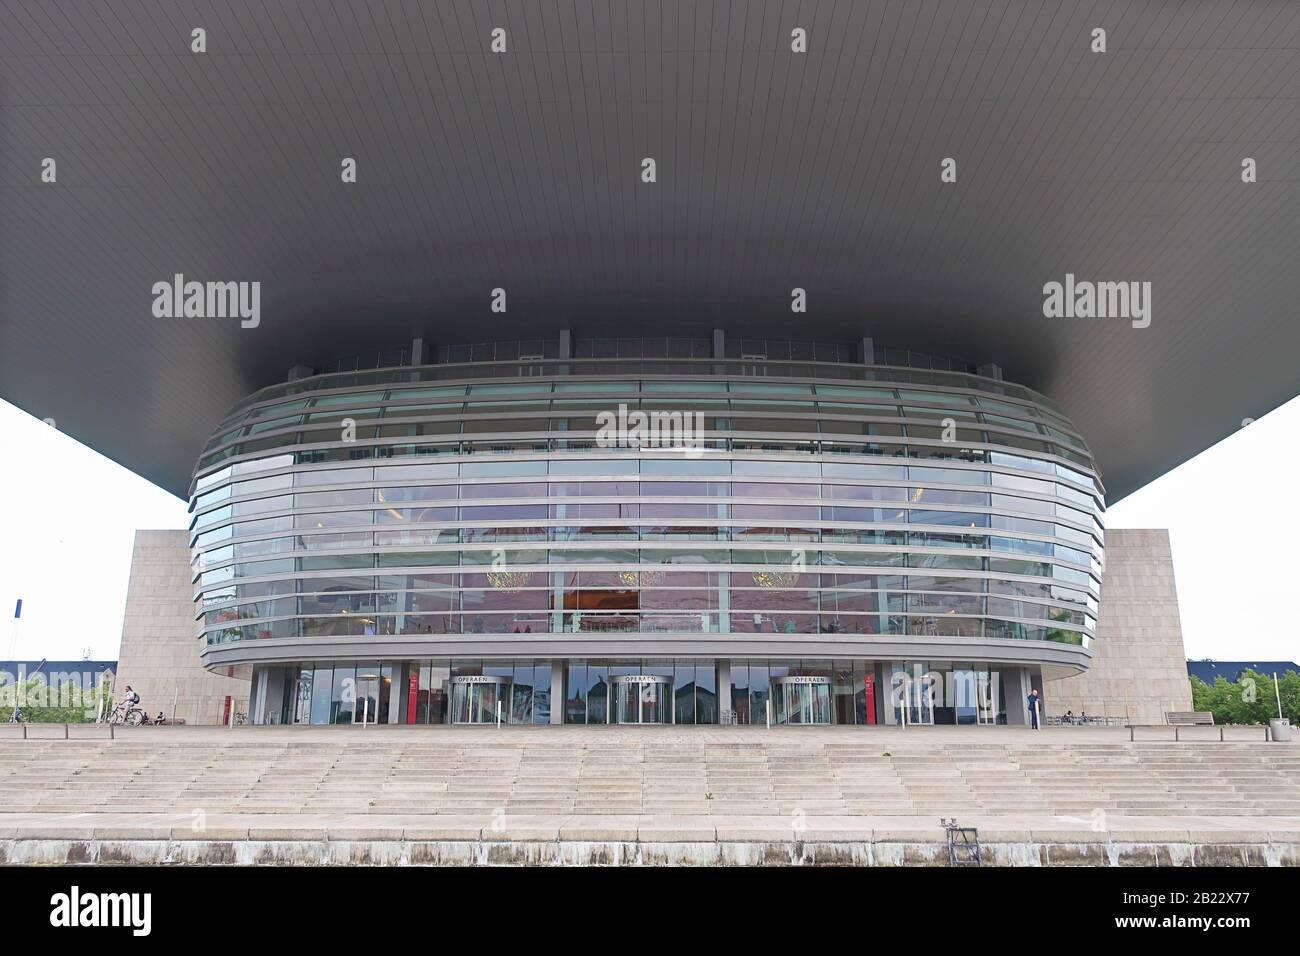 Copenhague, Danemark - 14 juin 2019 : l'Opéra de Copenhague, opéra national du Danemark Banque D'Images